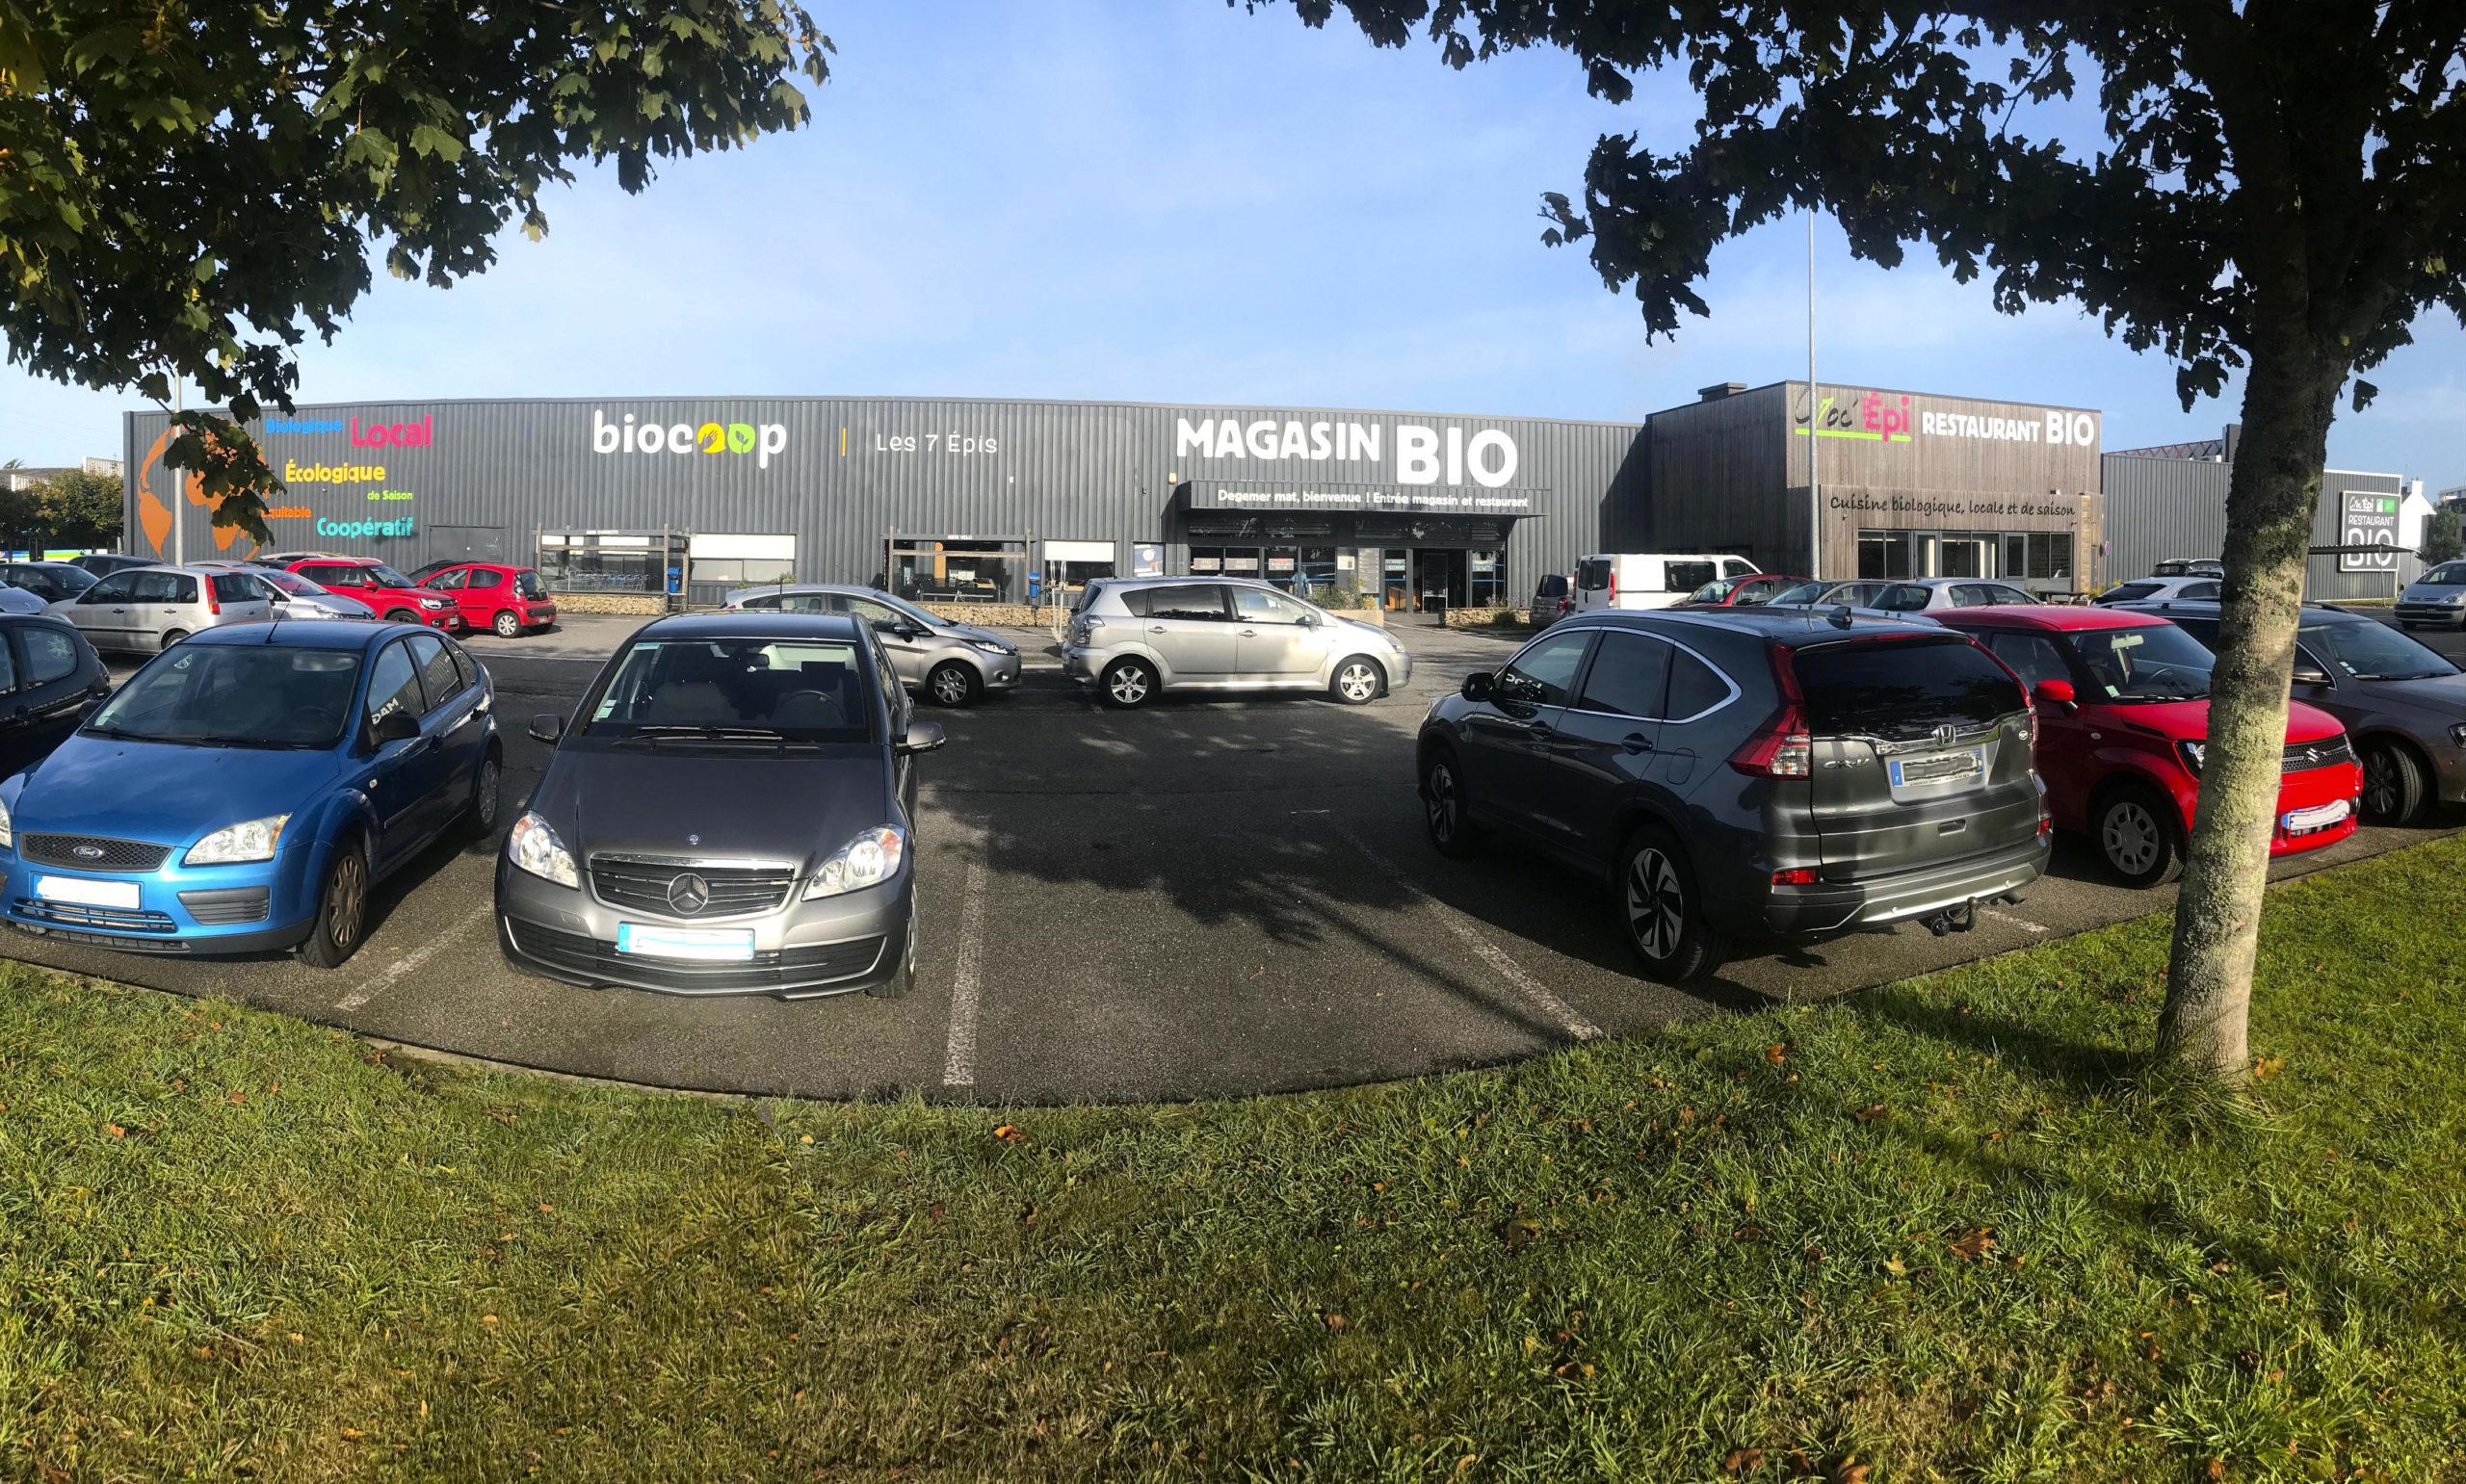 Magasin et parking Biocoop les 7 Epis Lorient Keryado